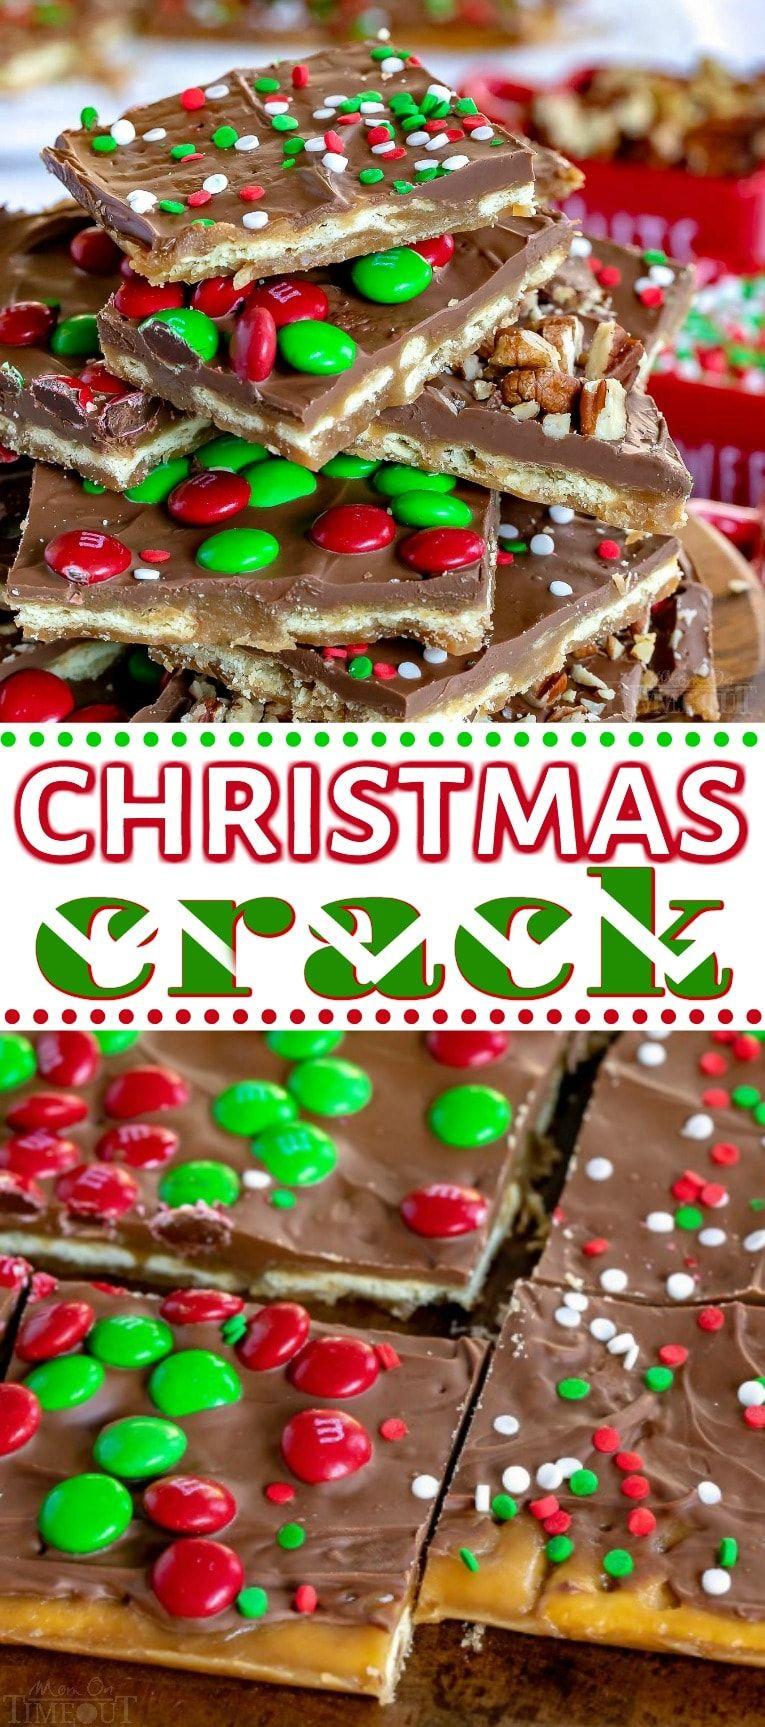 Christmas Crack - An Easy Saltine Toffee Recipe!